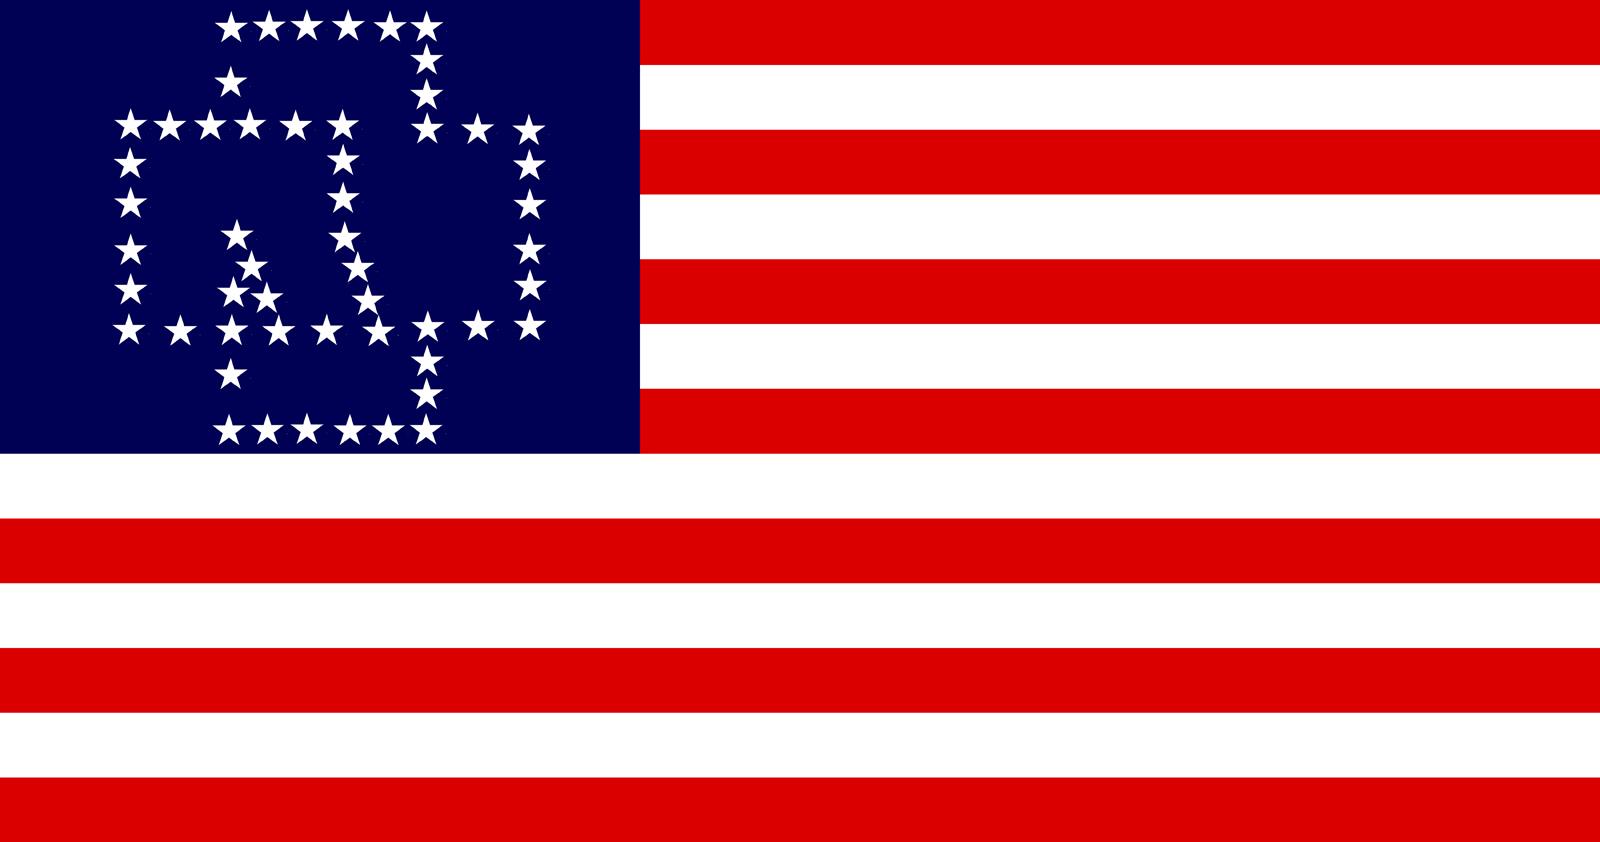 Rammstein Amerika Flag By Lotusbg On Deviantart